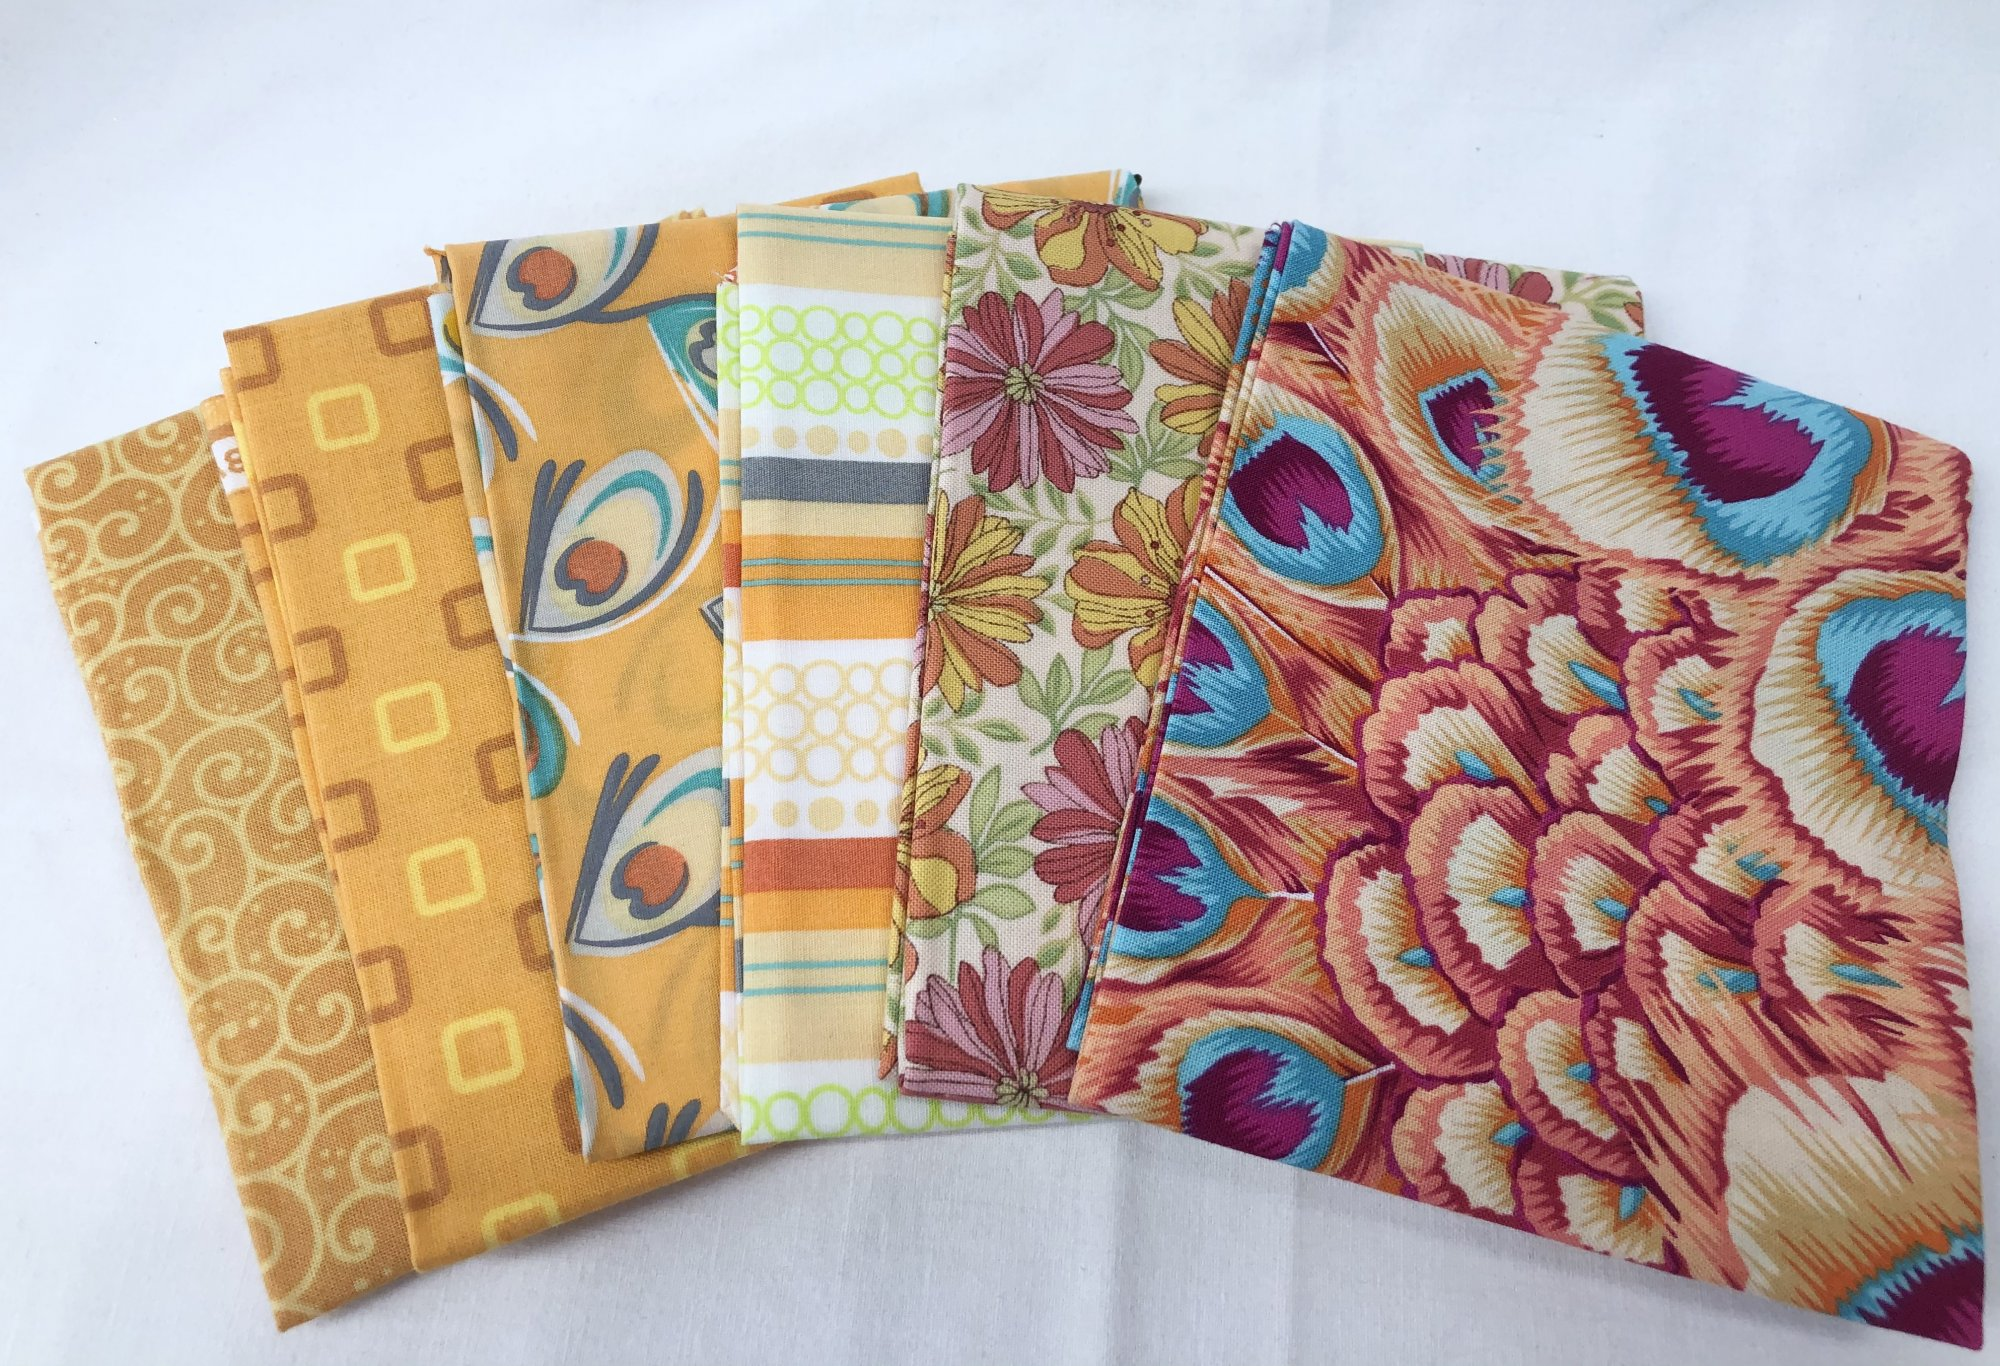 Fat Quarter Pack - 6pcs/bundle - In store - Orange